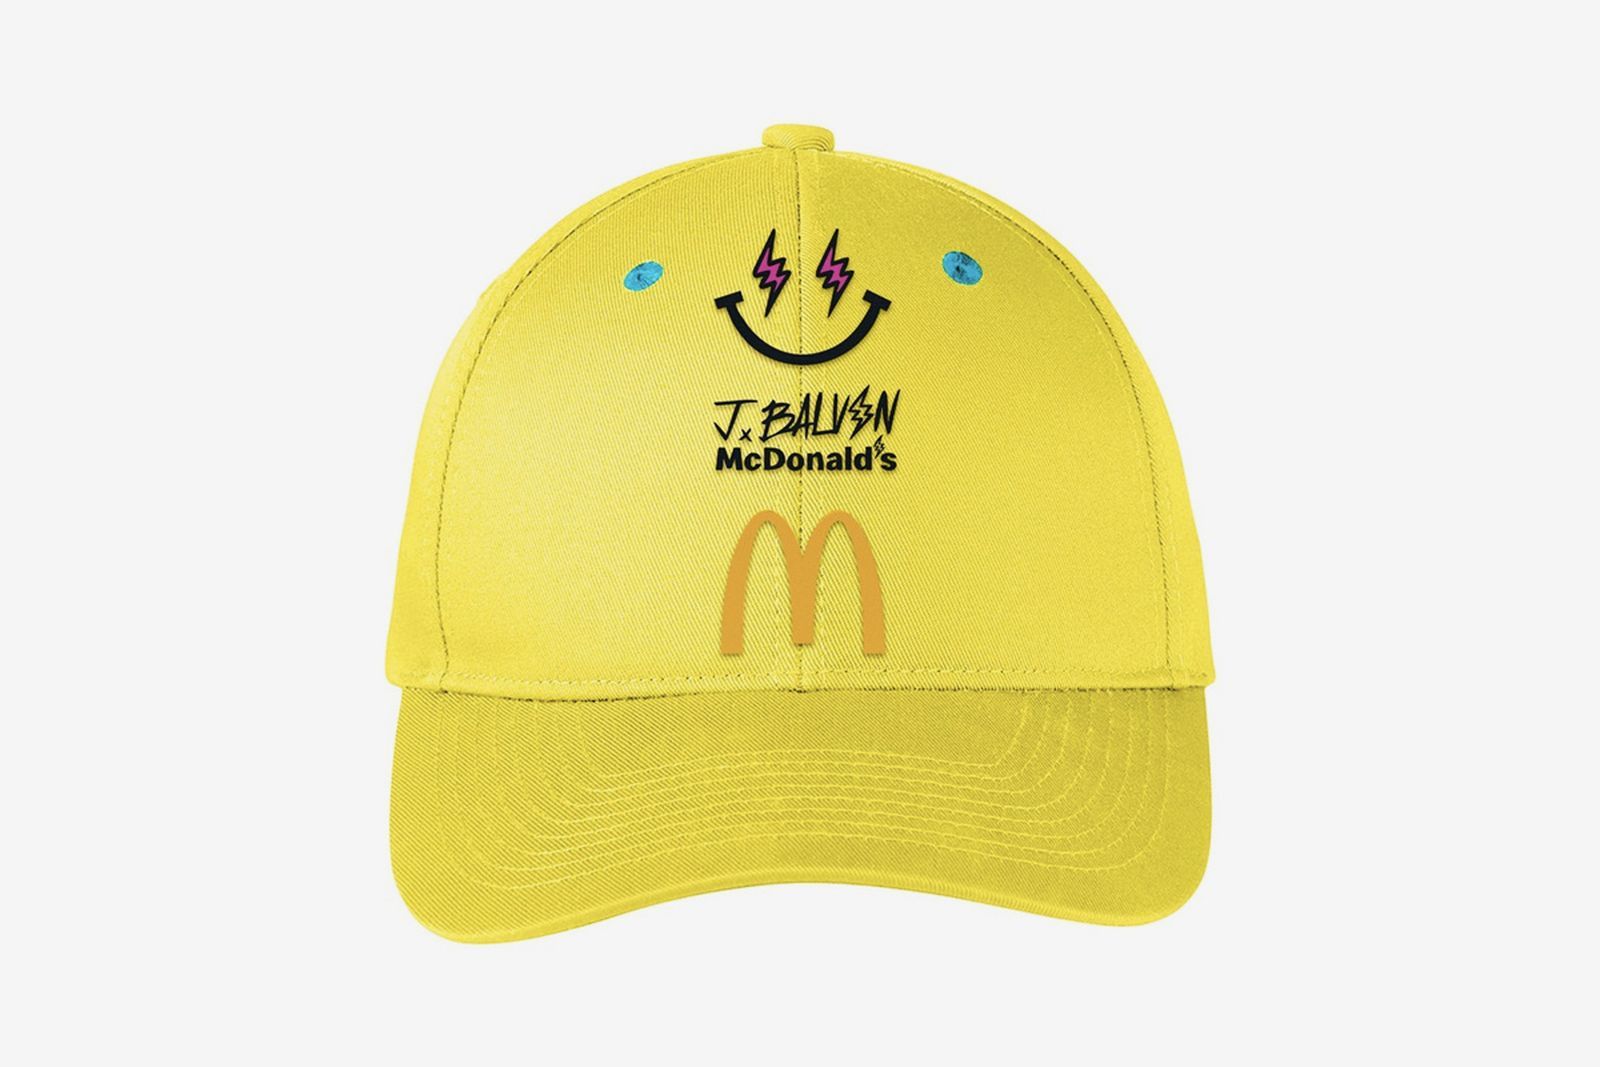 j-balvin-mcdonalds-collaboration-08